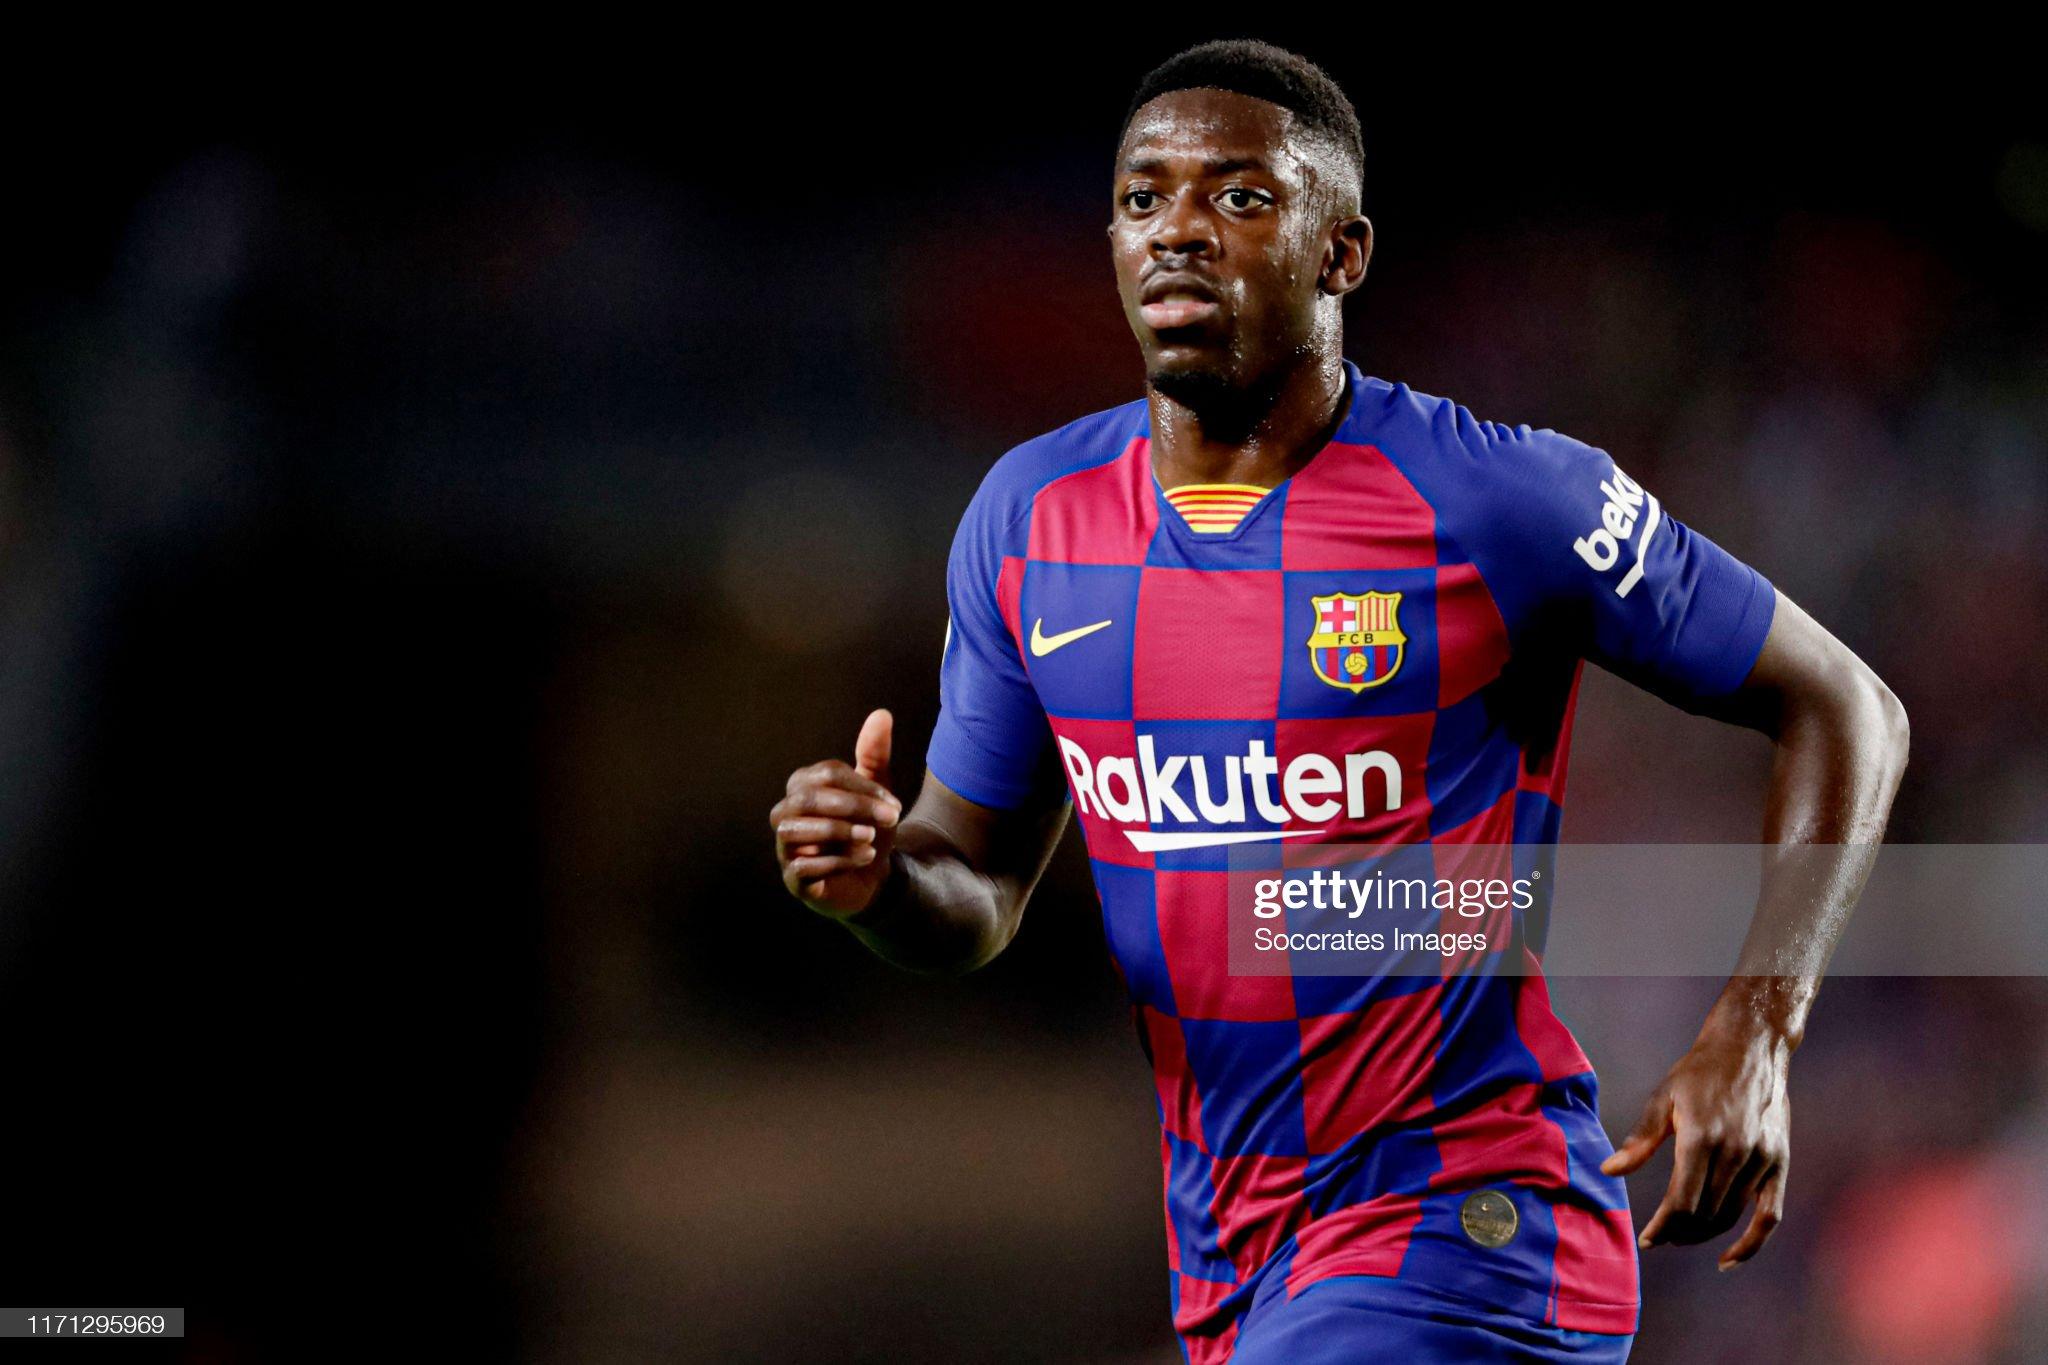 صور مباراة : برشلونة - فياريال 2-1 ( 24-09-2019 )  Ousmane-dembele-of-fc-barcelona-during-the-la-liga-santander-match-picture-id1171295969?s=2048x2048